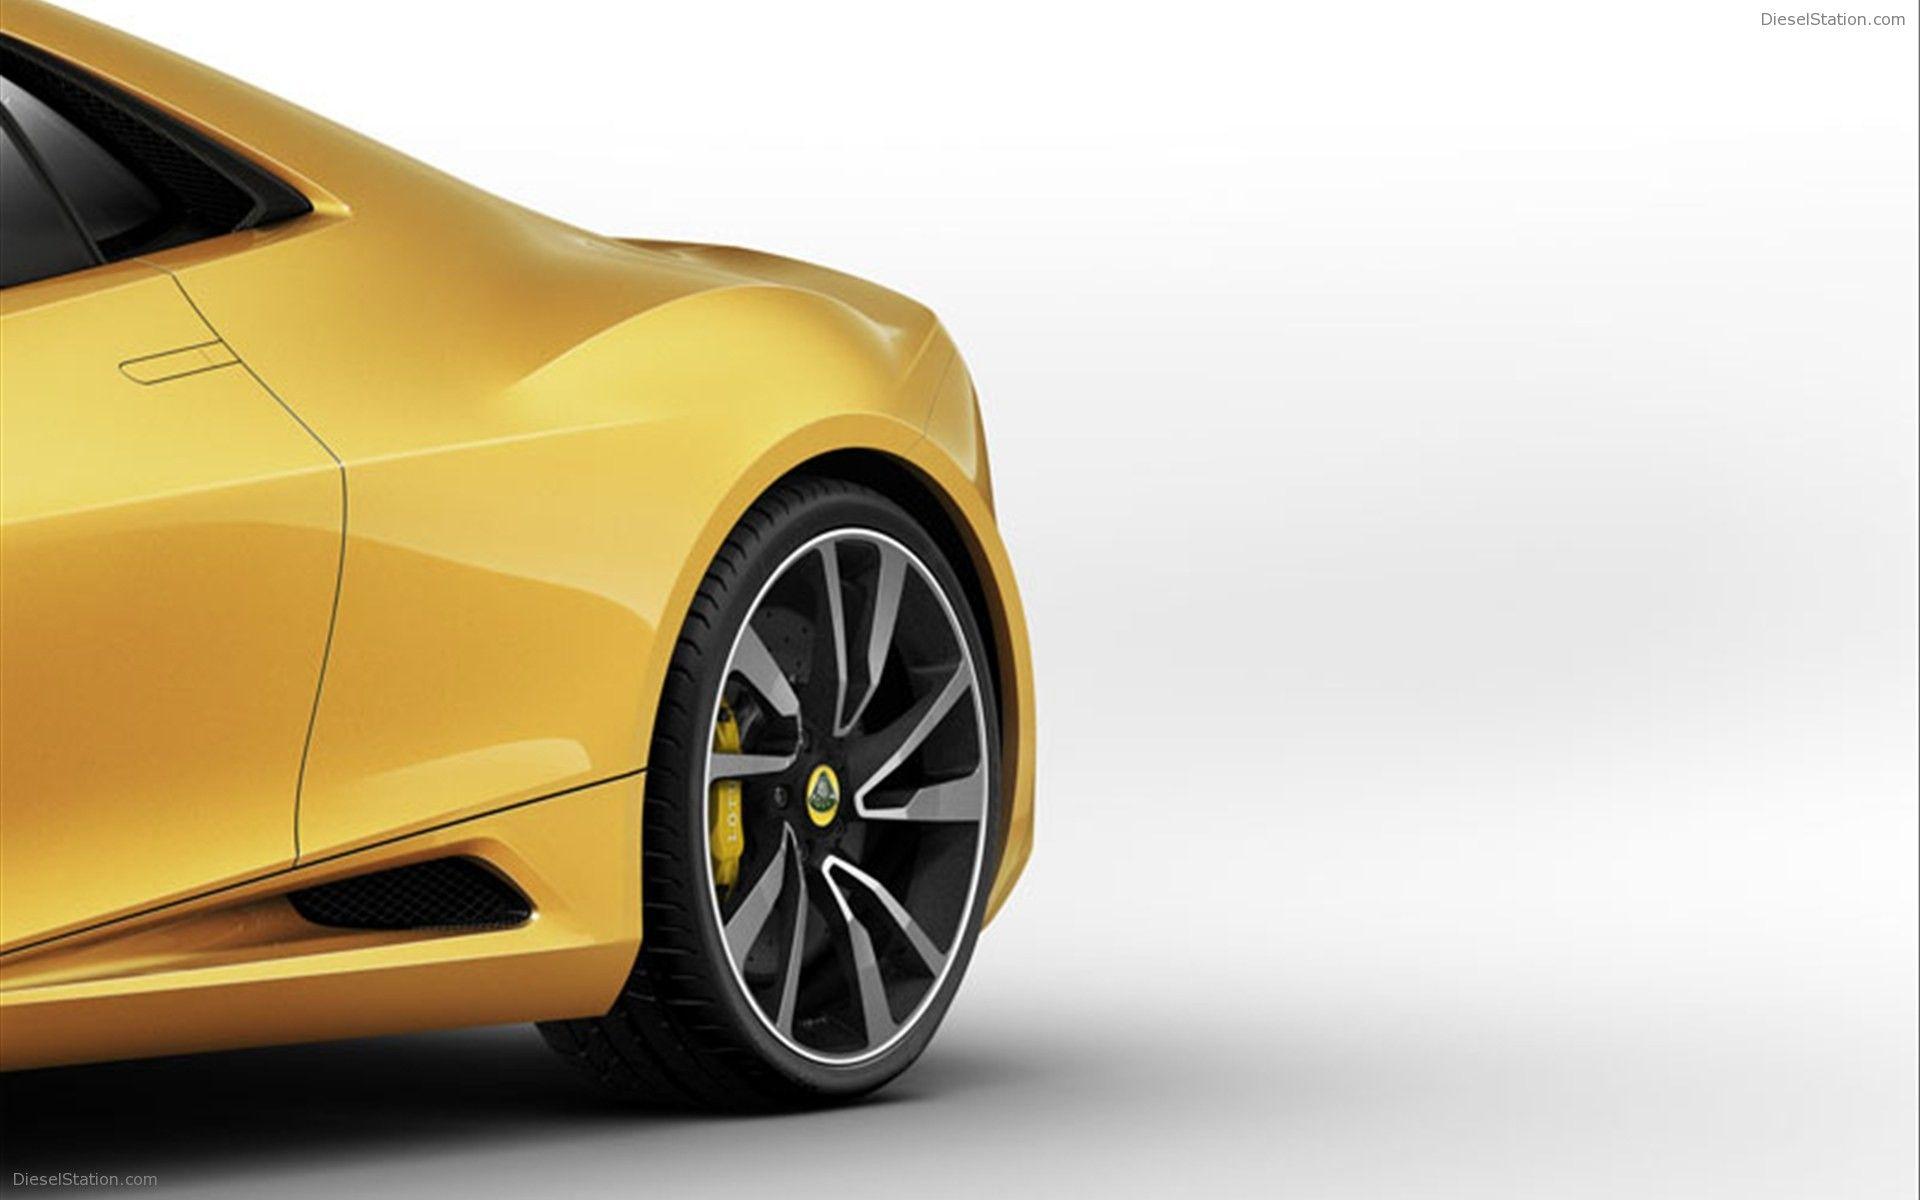 lotus concept cars wallpaperpublic car | wallpapers for desktop